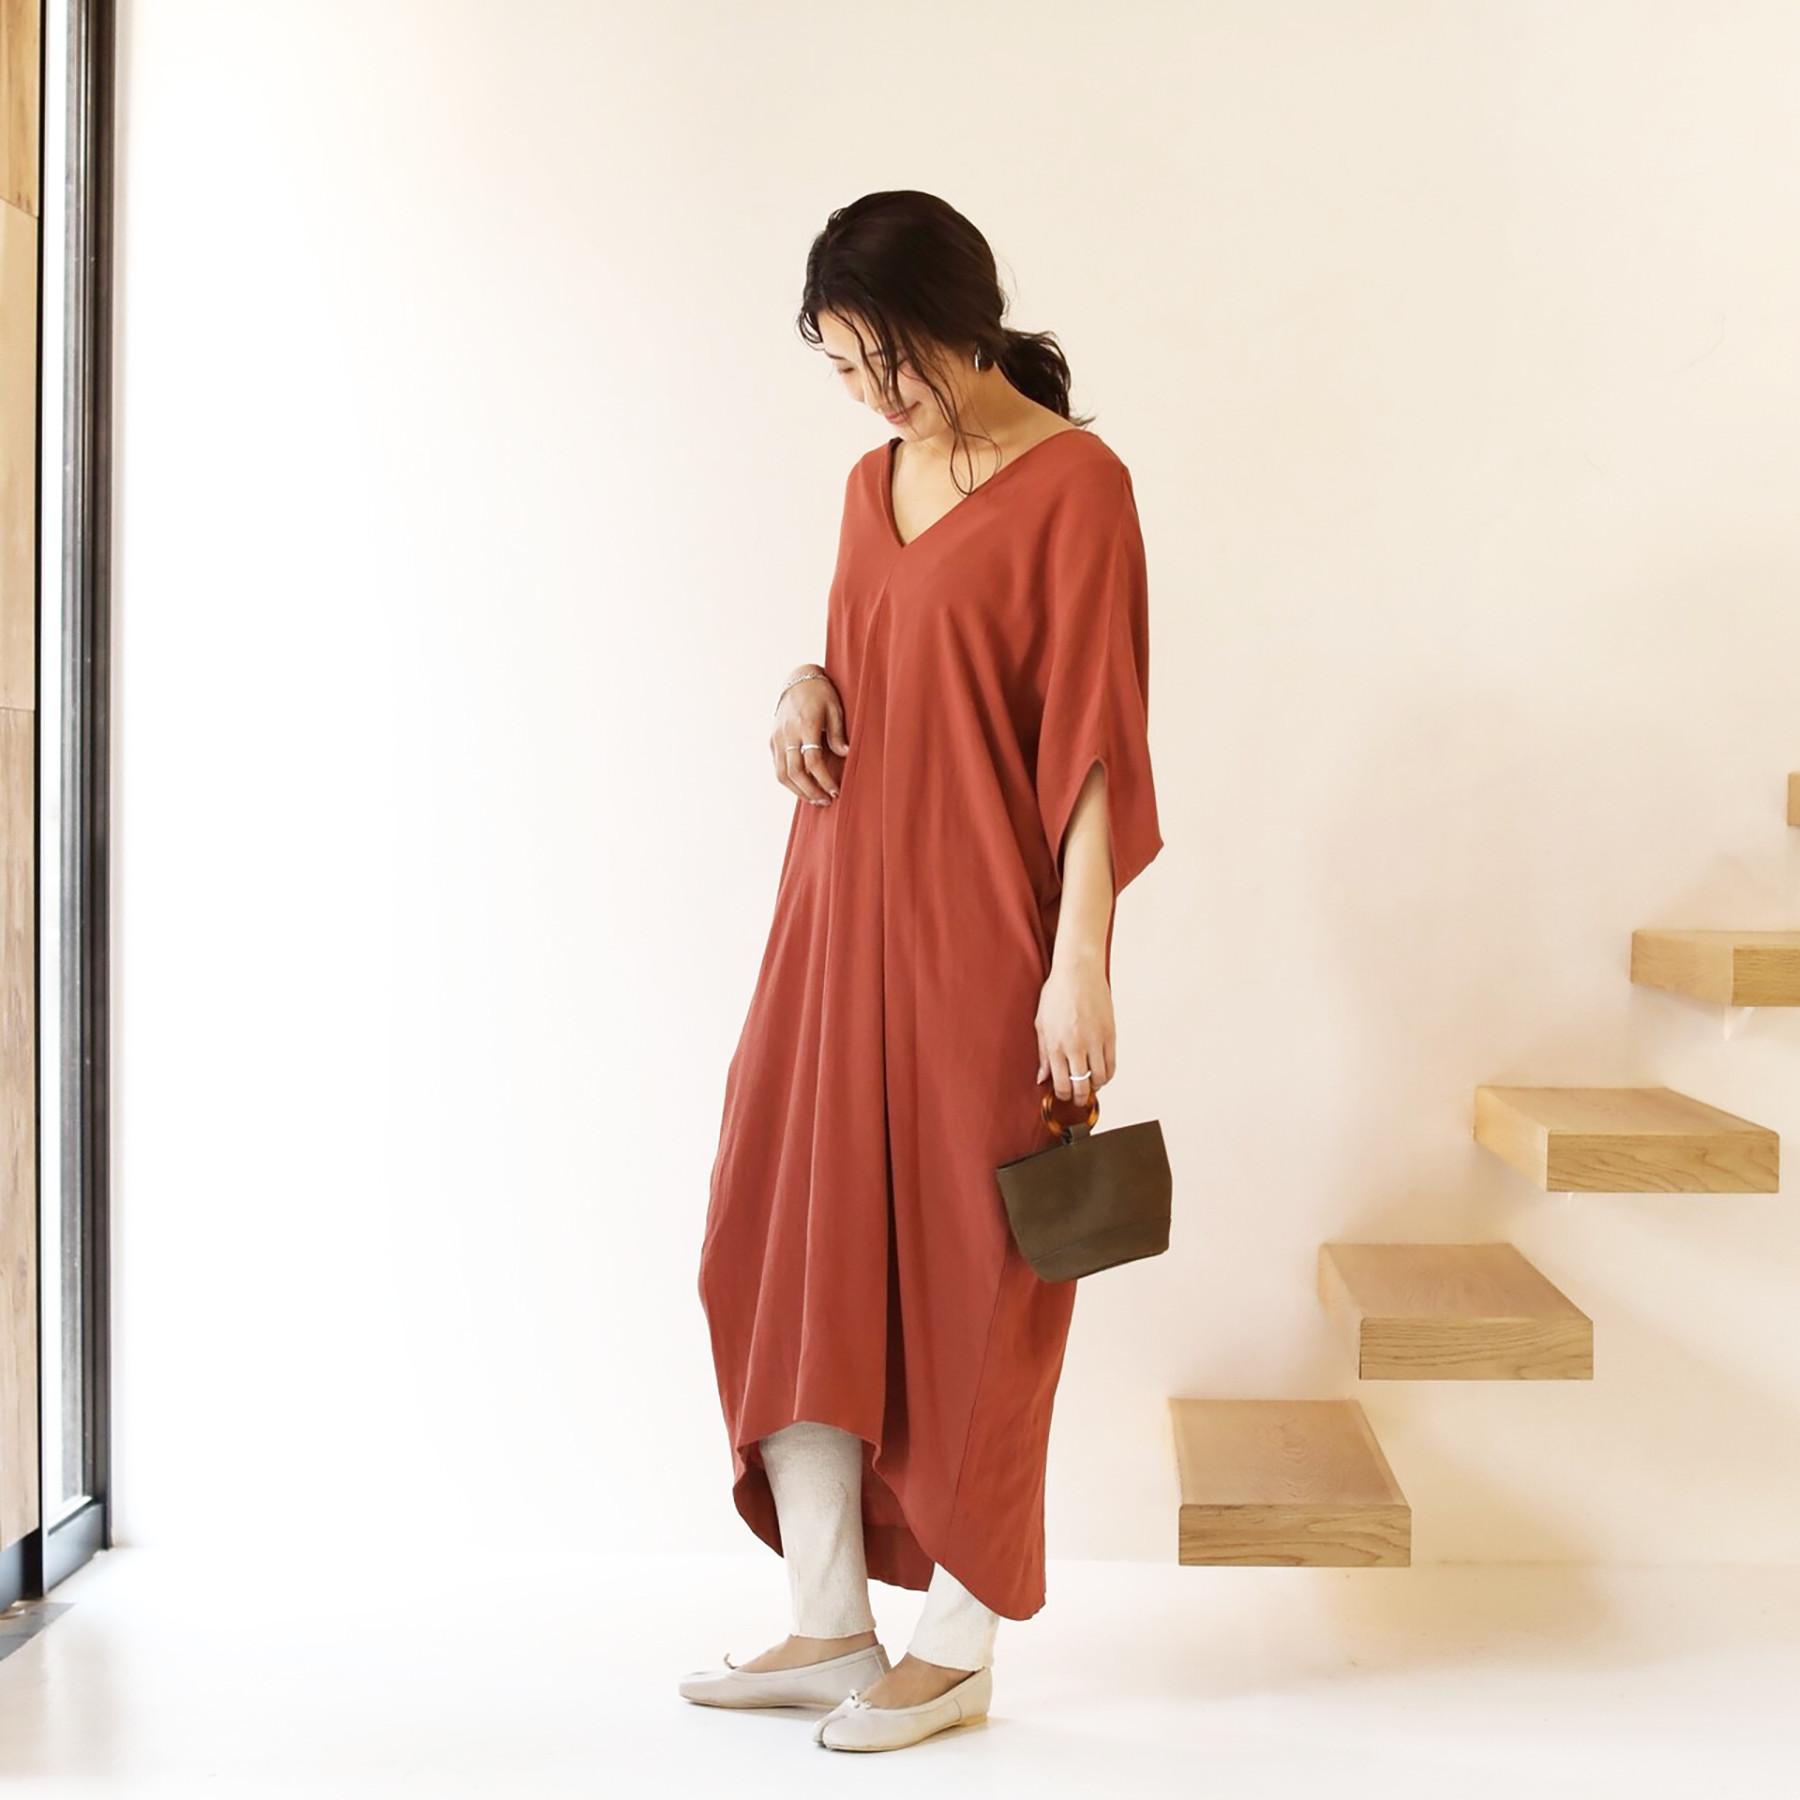 Cocoon Sack Dress